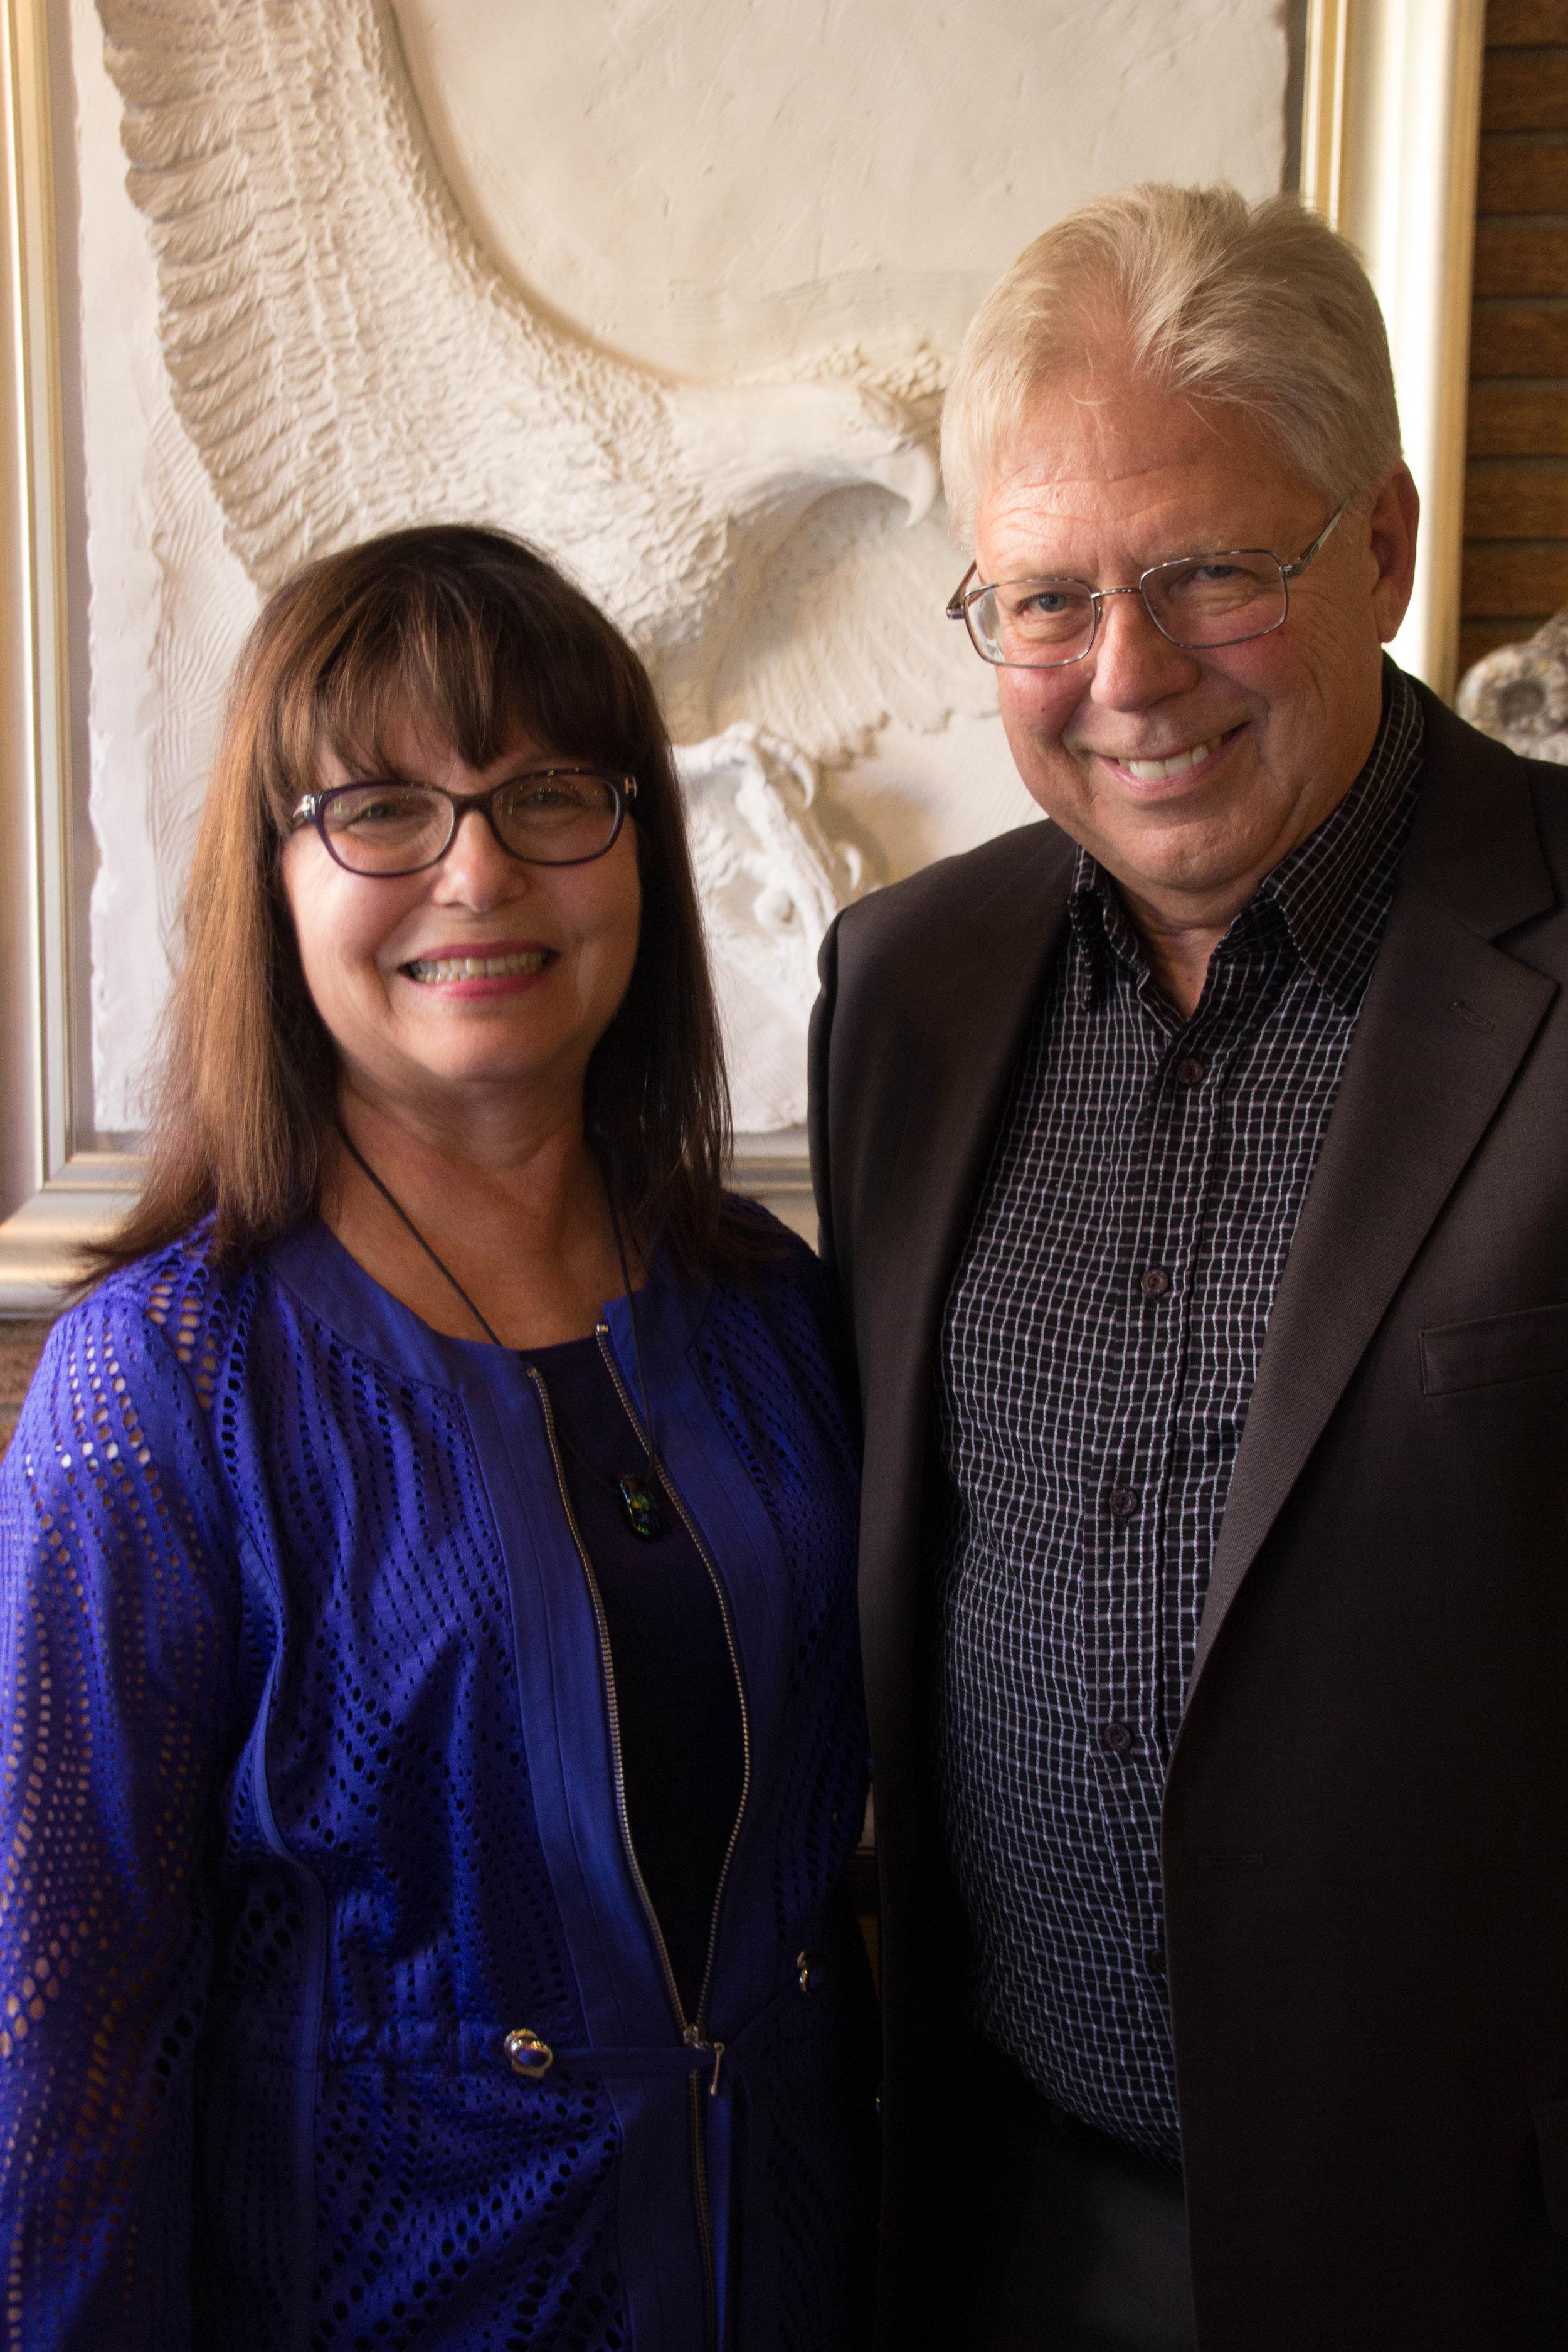 Deborah Benedic and Nelson McKinnon, owners of The Loft Fine Art